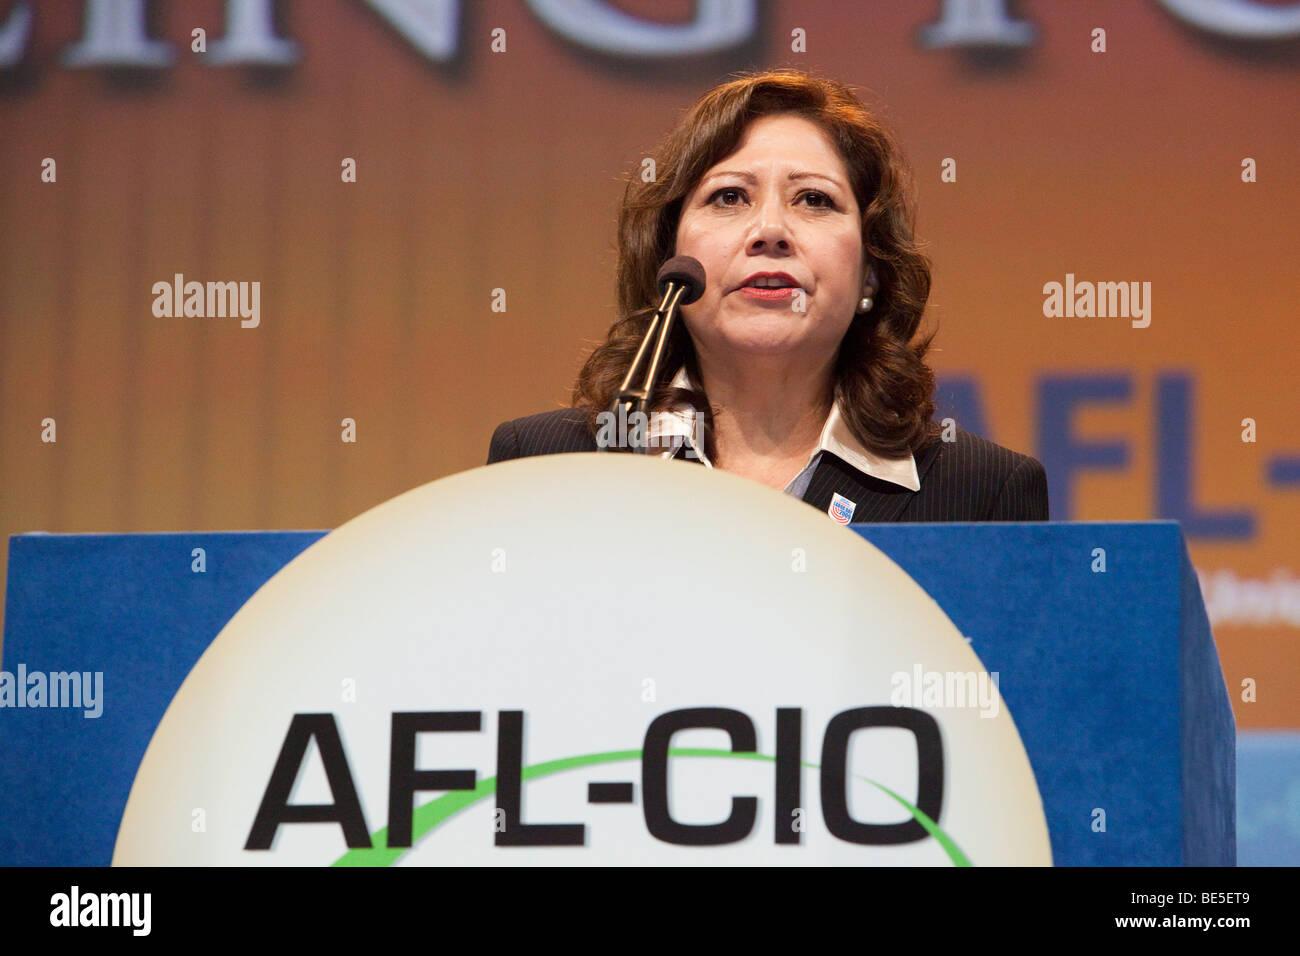 Pittsburgh, Pennsylvania - Secretary of Labor Hilda Solis speaks at the AFL-CIO convention. - Stock Image